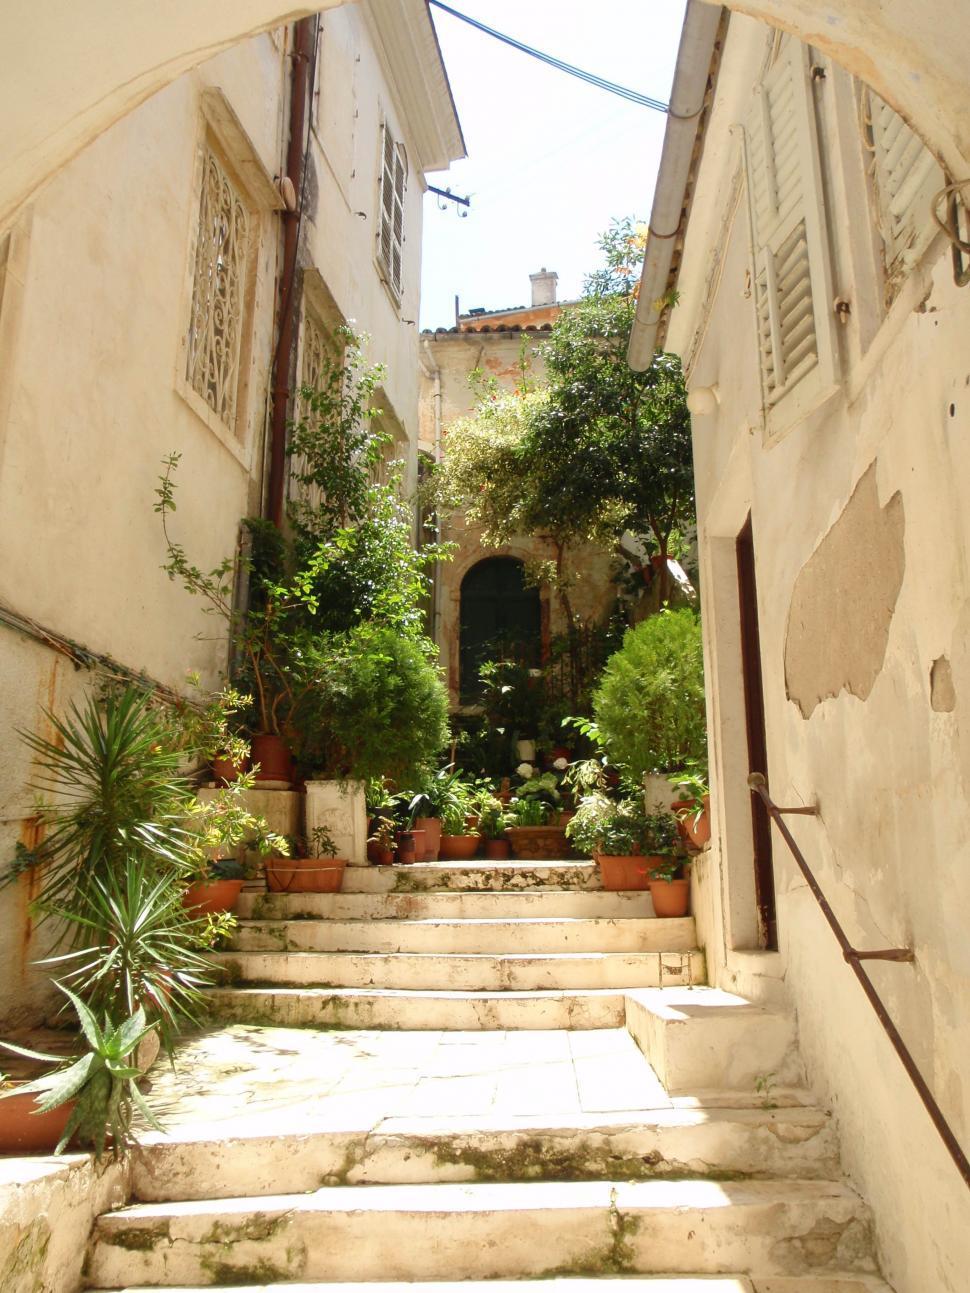 Download Free Stock HD Photo of Around Corfu, Steps to house, Corfu Town. Online